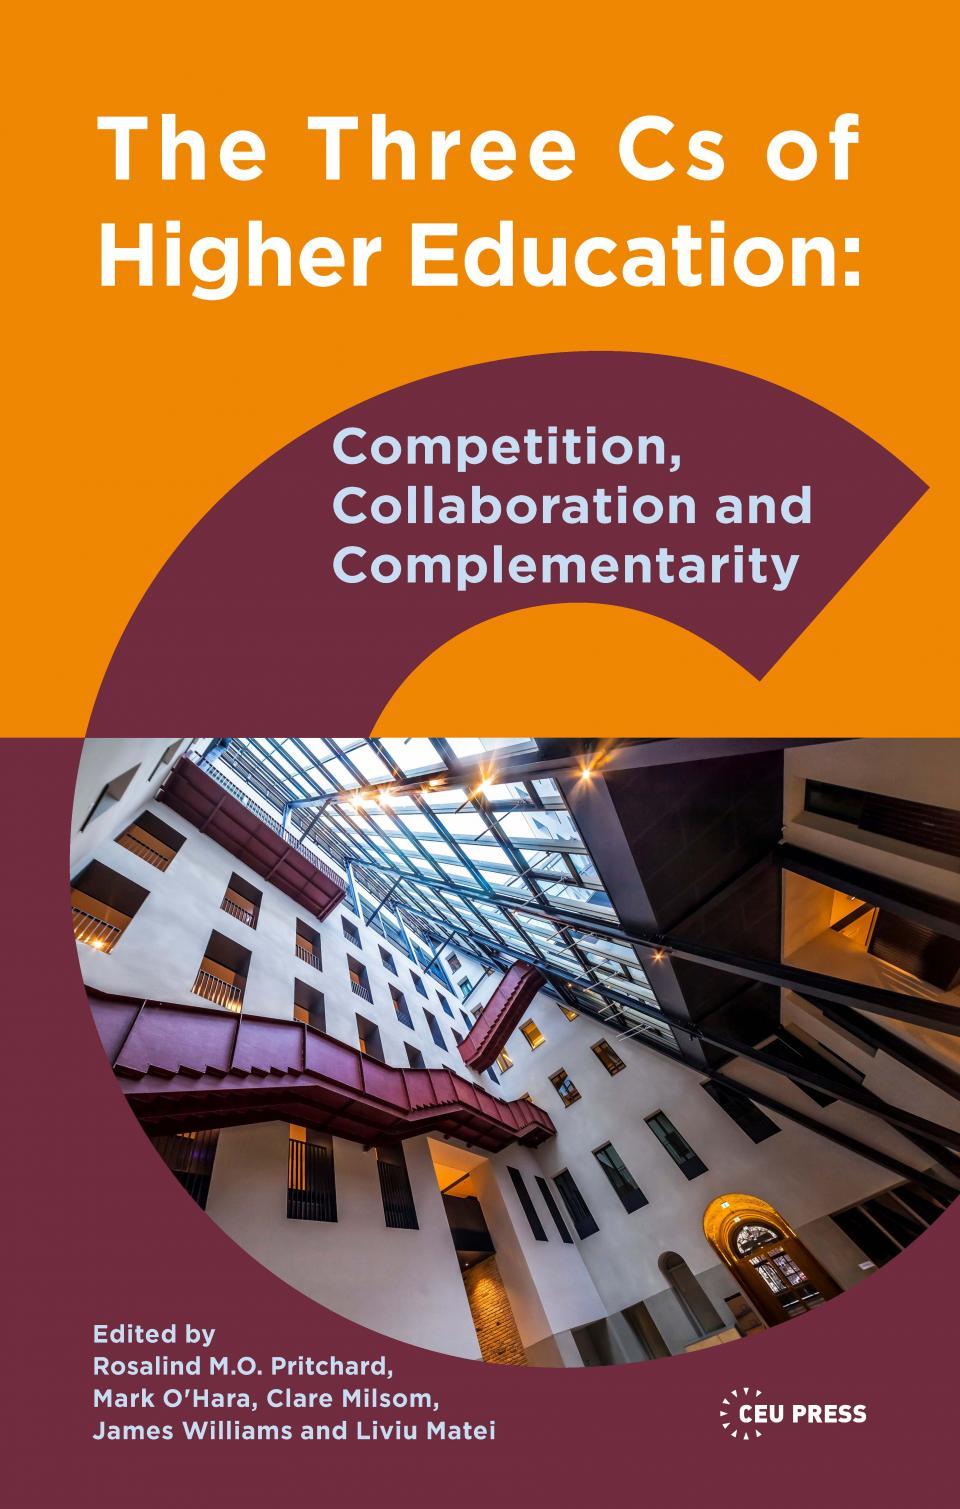 The Three Cs of Higher Education | CEUPress